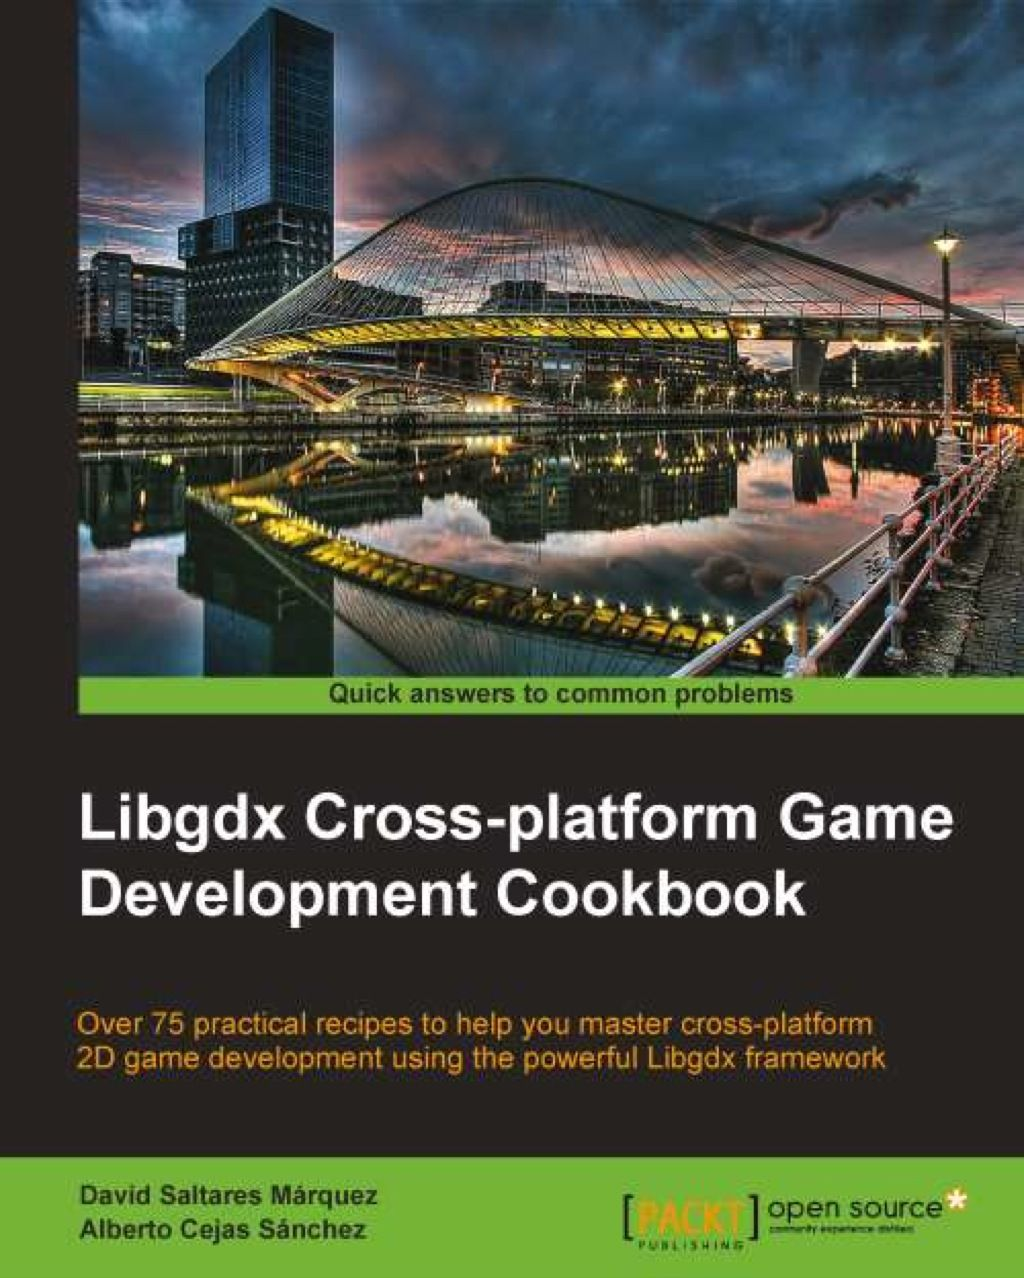 Libgdx Crossplatform Game Development Cookbook (eBook